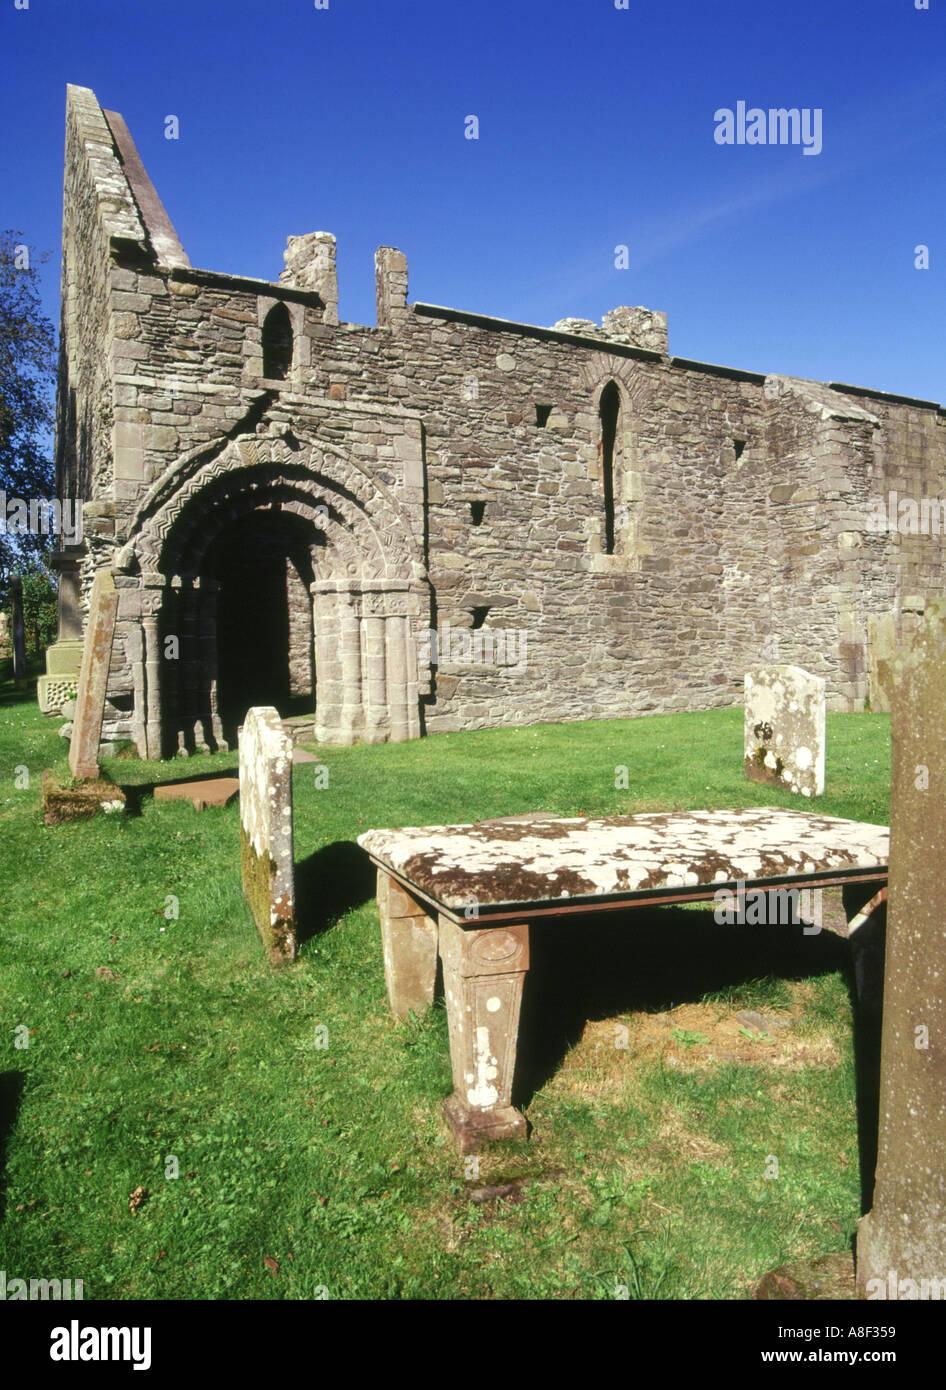 dh  WHITHORN DUMFRIES Whithorn Priory Romanesque doorway pilgramage centre St Ninian Stock Photo